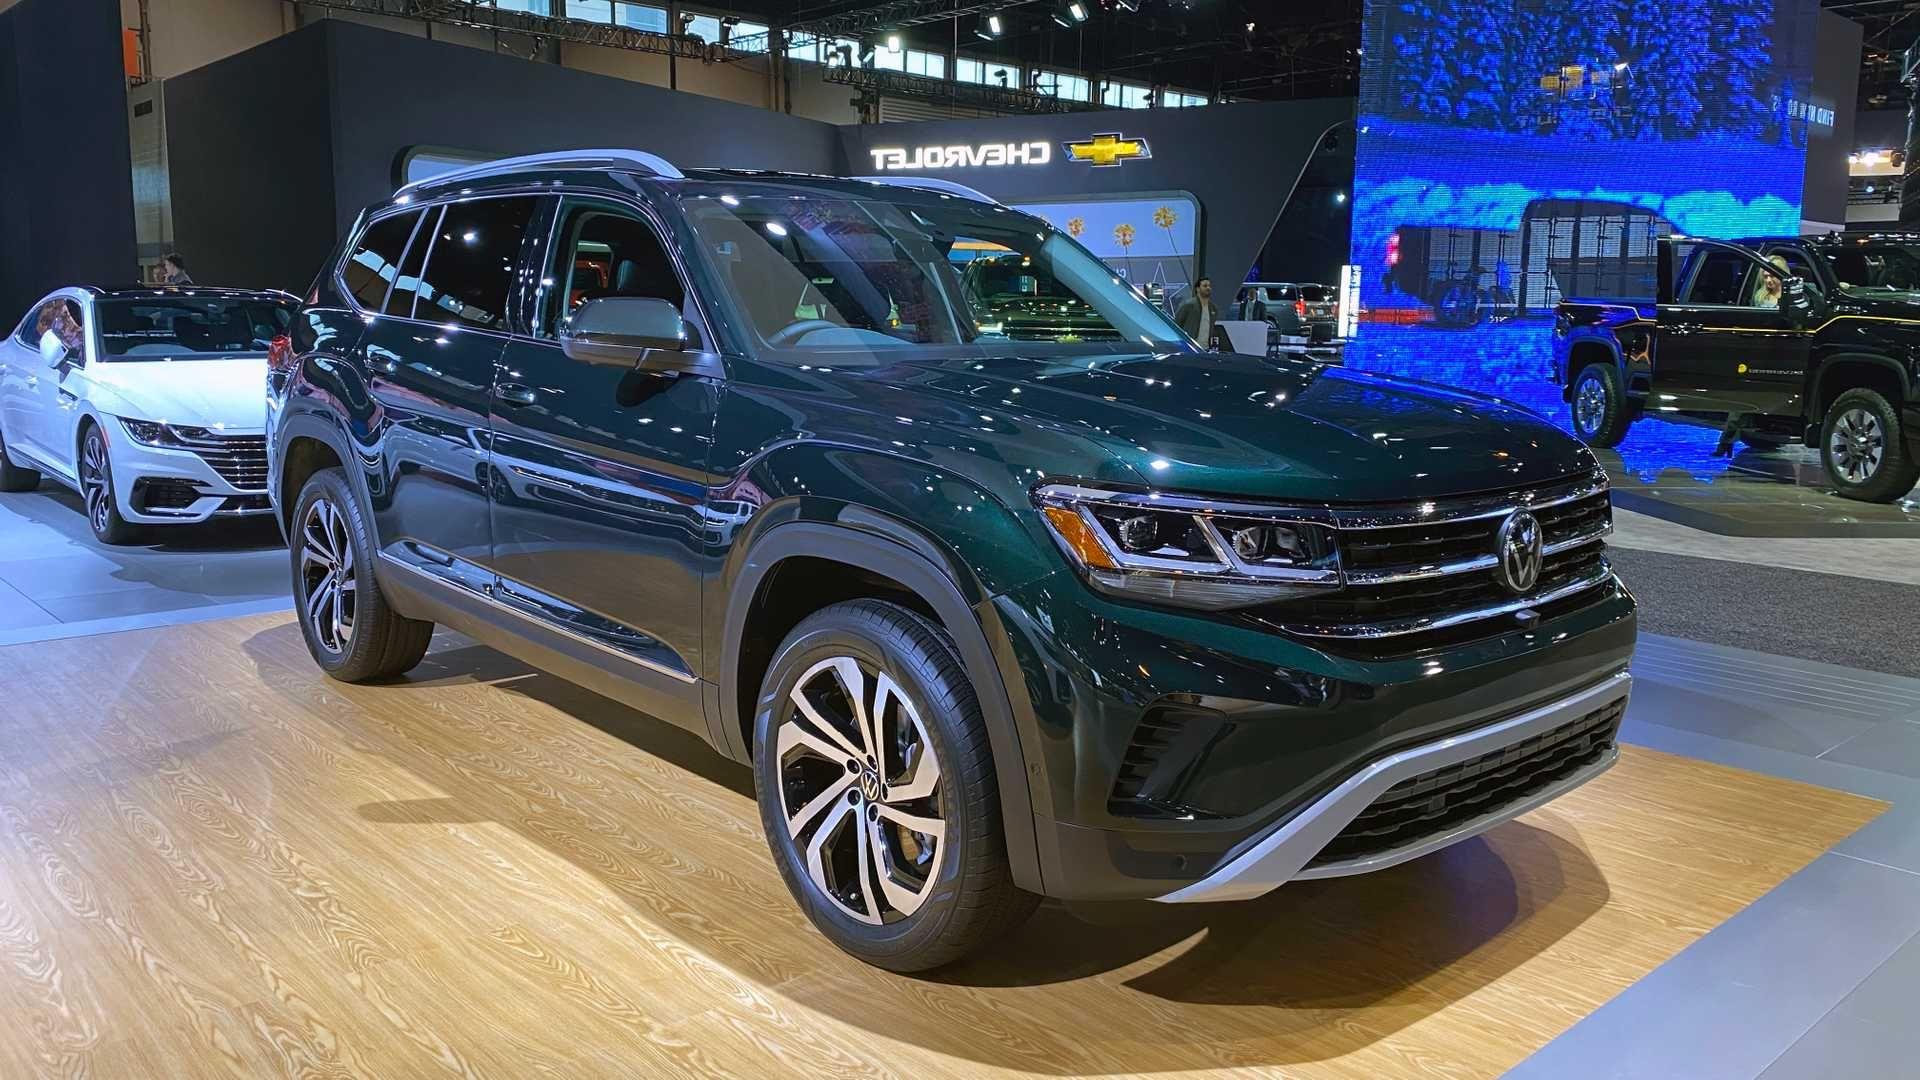 2021 Vw Atlas 3rd Row Release Date Interior Changes In 2020 Volkswagen Fuel Economy The Row